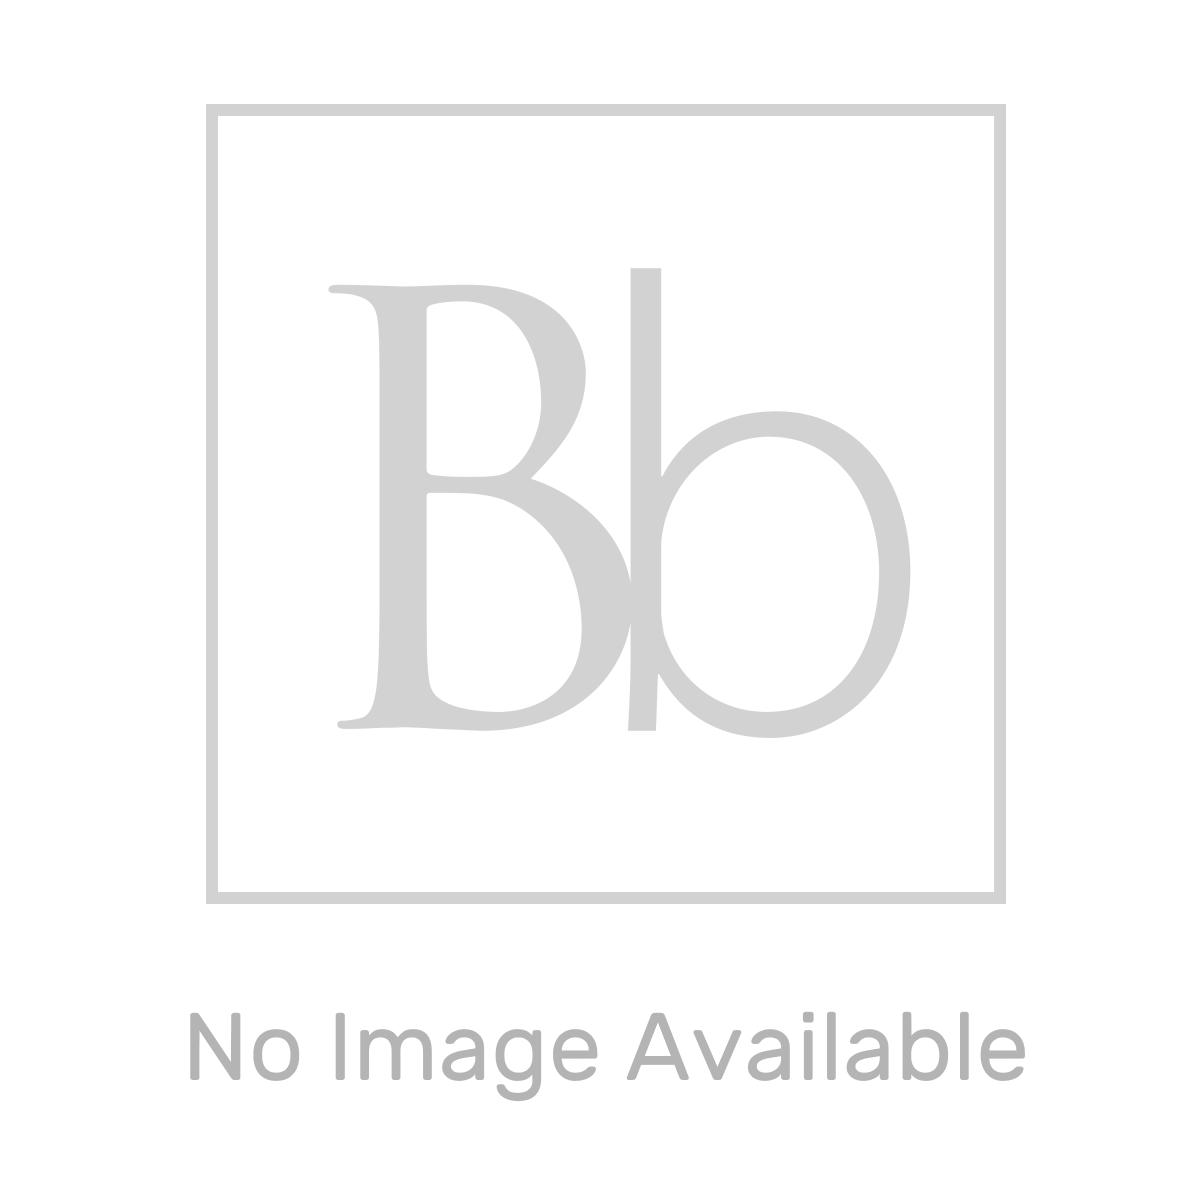 Aquadart White Slate Shower Tray 1700 x 760 Lifestyle